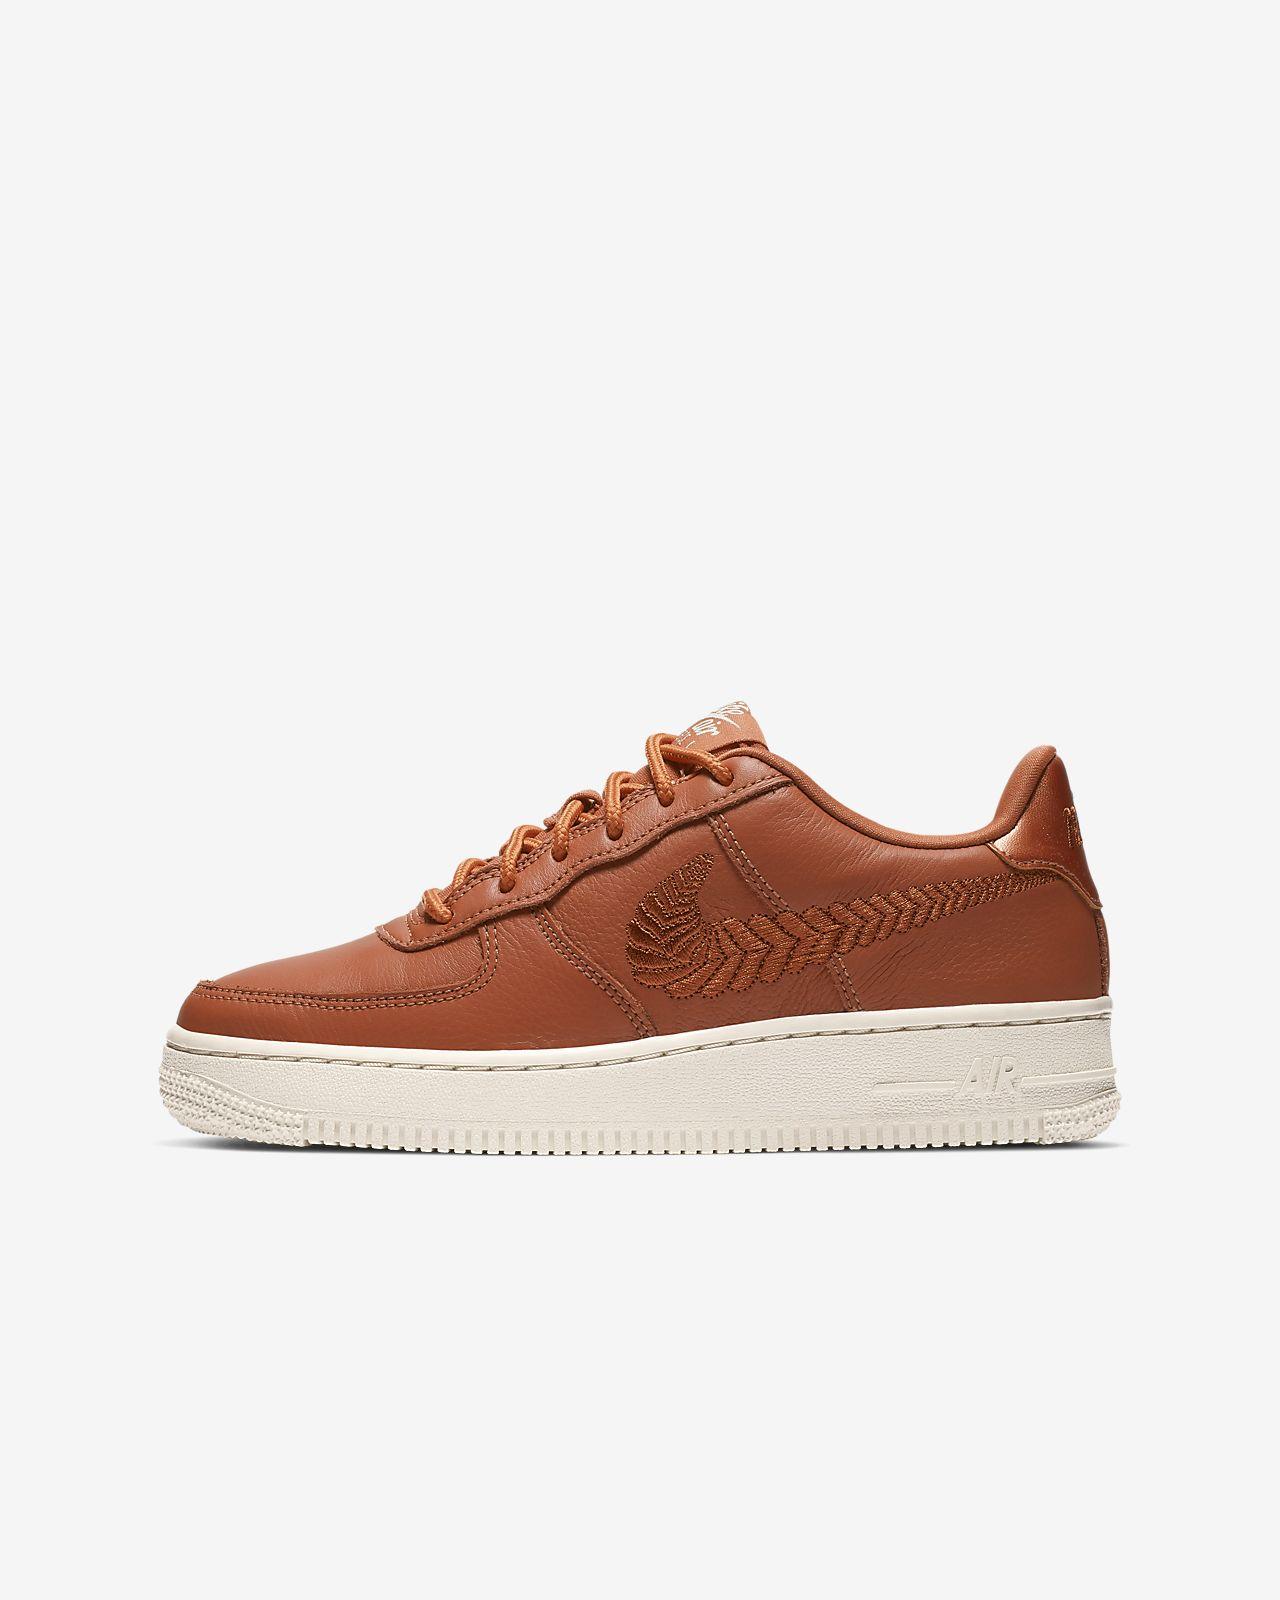 Nike Air Force 1 Premium Embroidered-sko til store børn